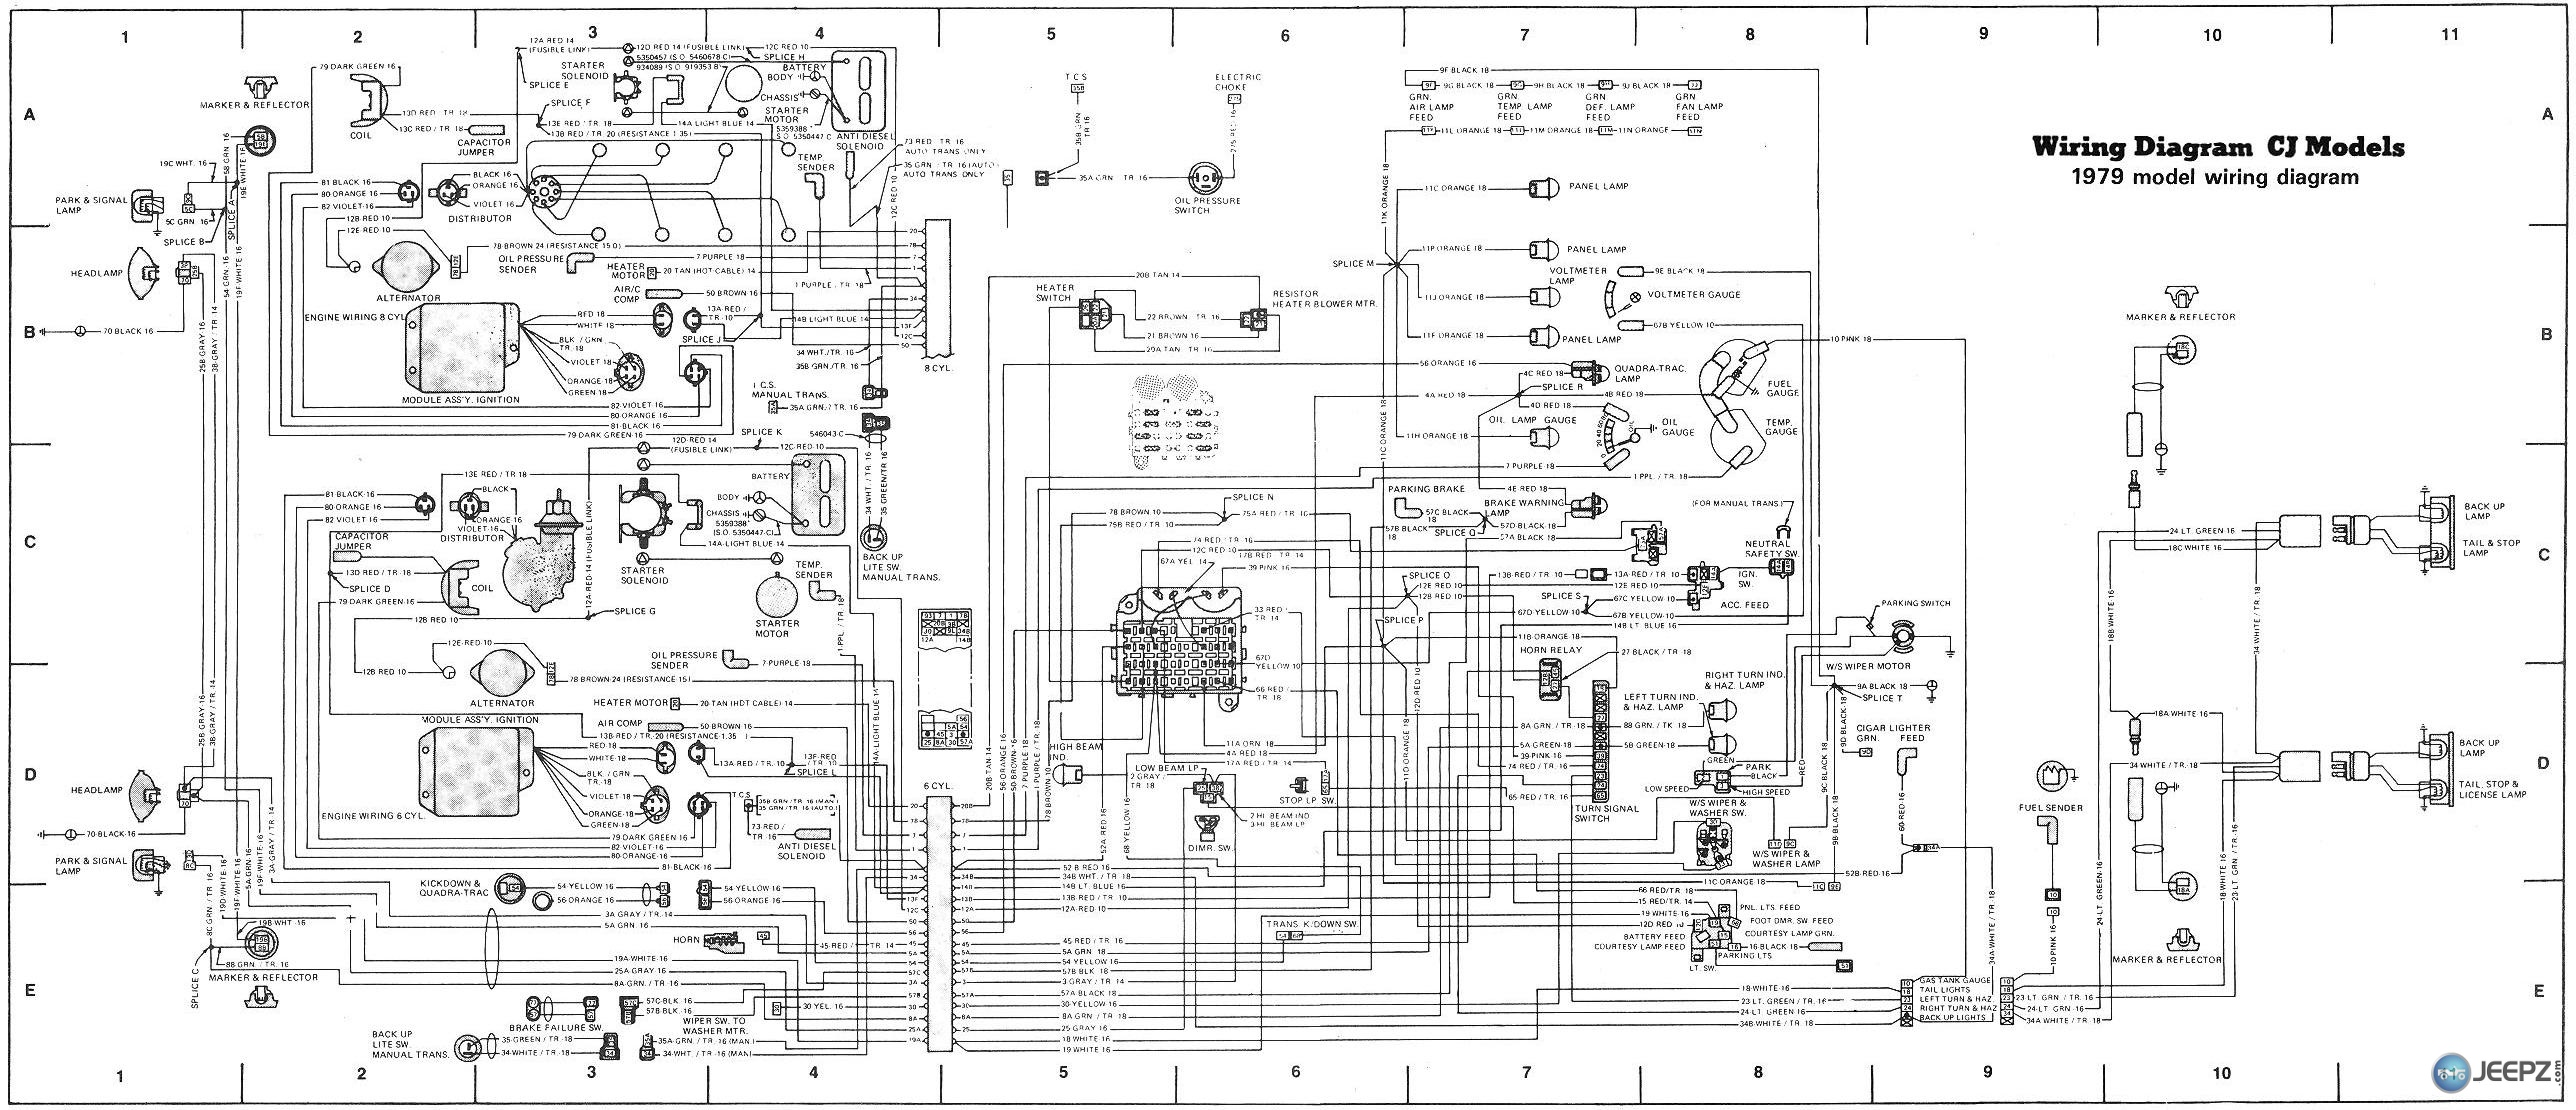 2002 Fuse Diagrams Auto Electrical Wiring Diagram Sun Visor 1991 Chevy S10 Cj5